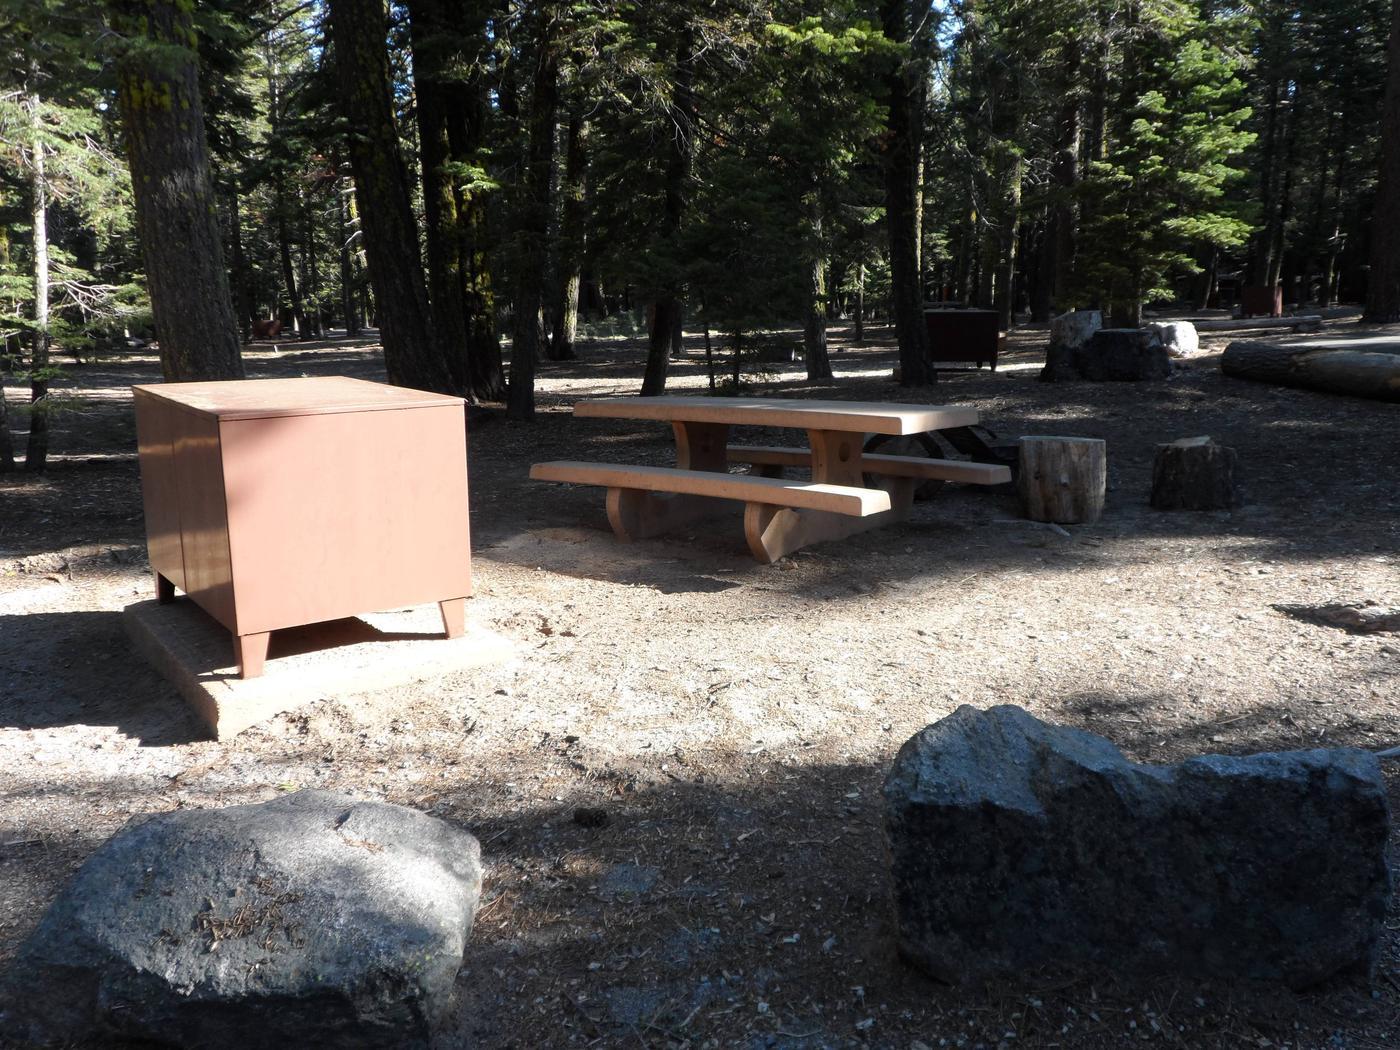 Site B18Manzanita Lake Campground, Site B18